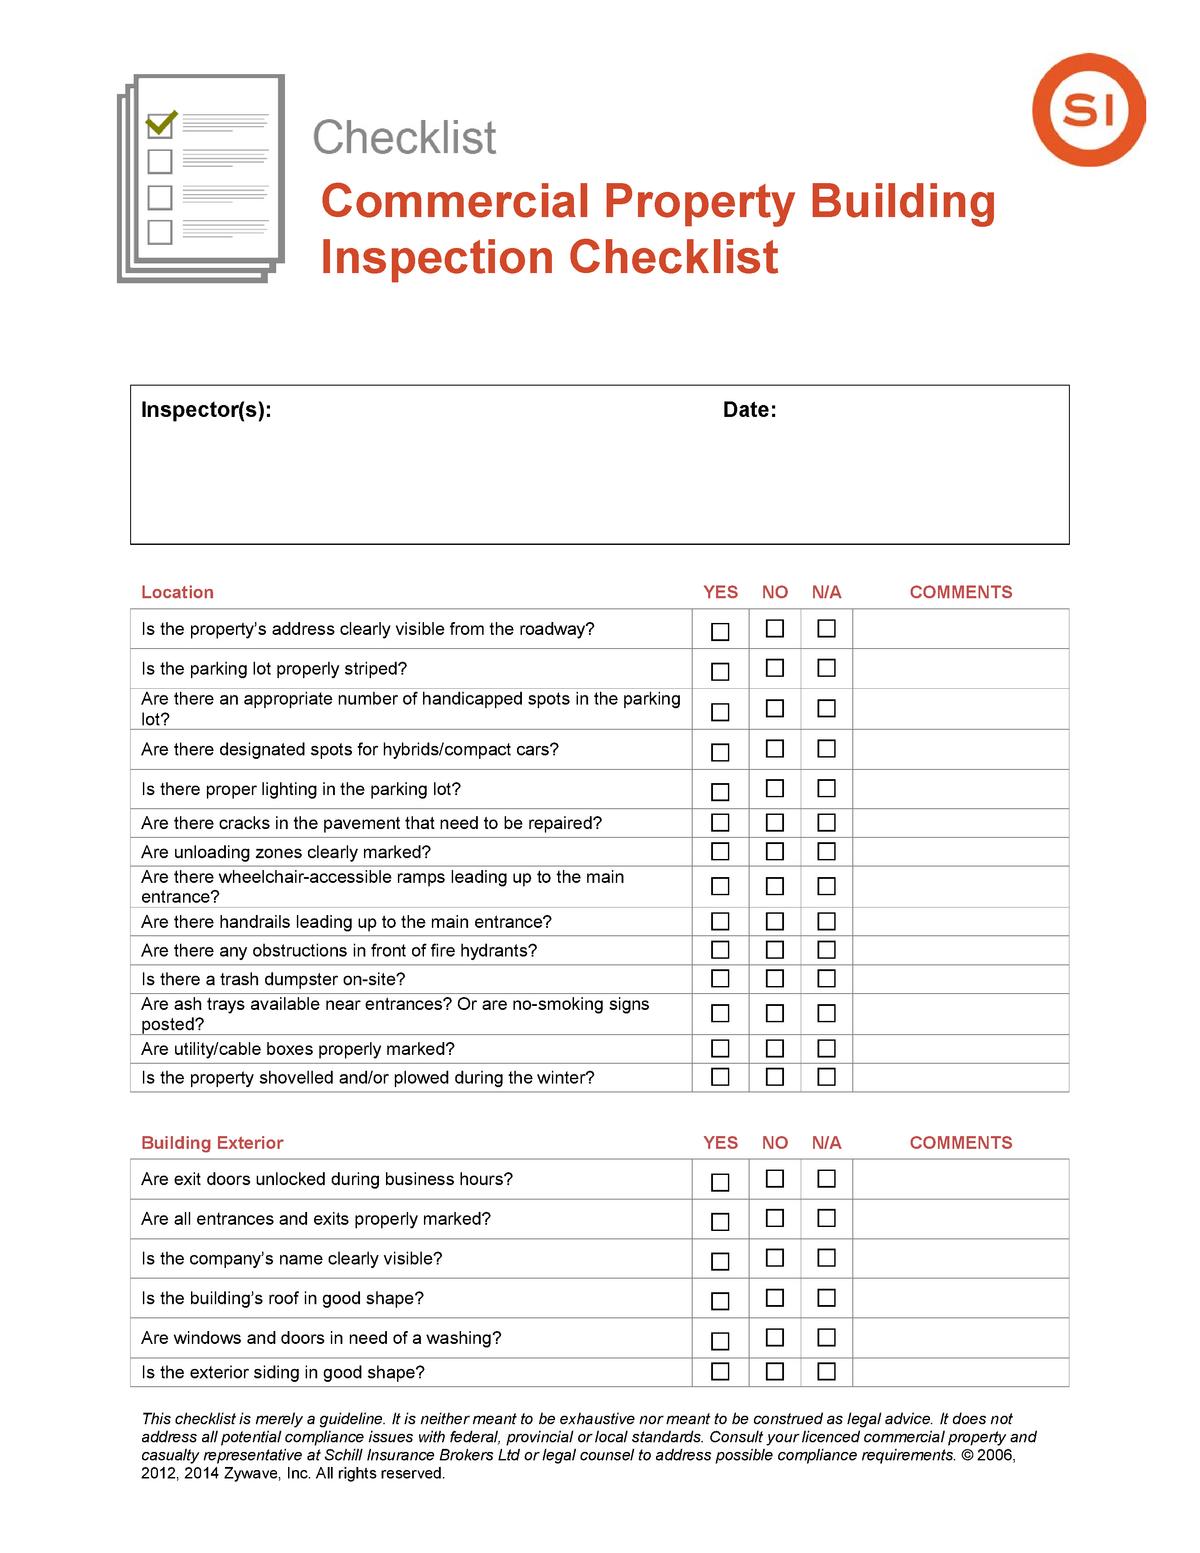 Commercial Property Building Inspection Checklist U Of T Studocu